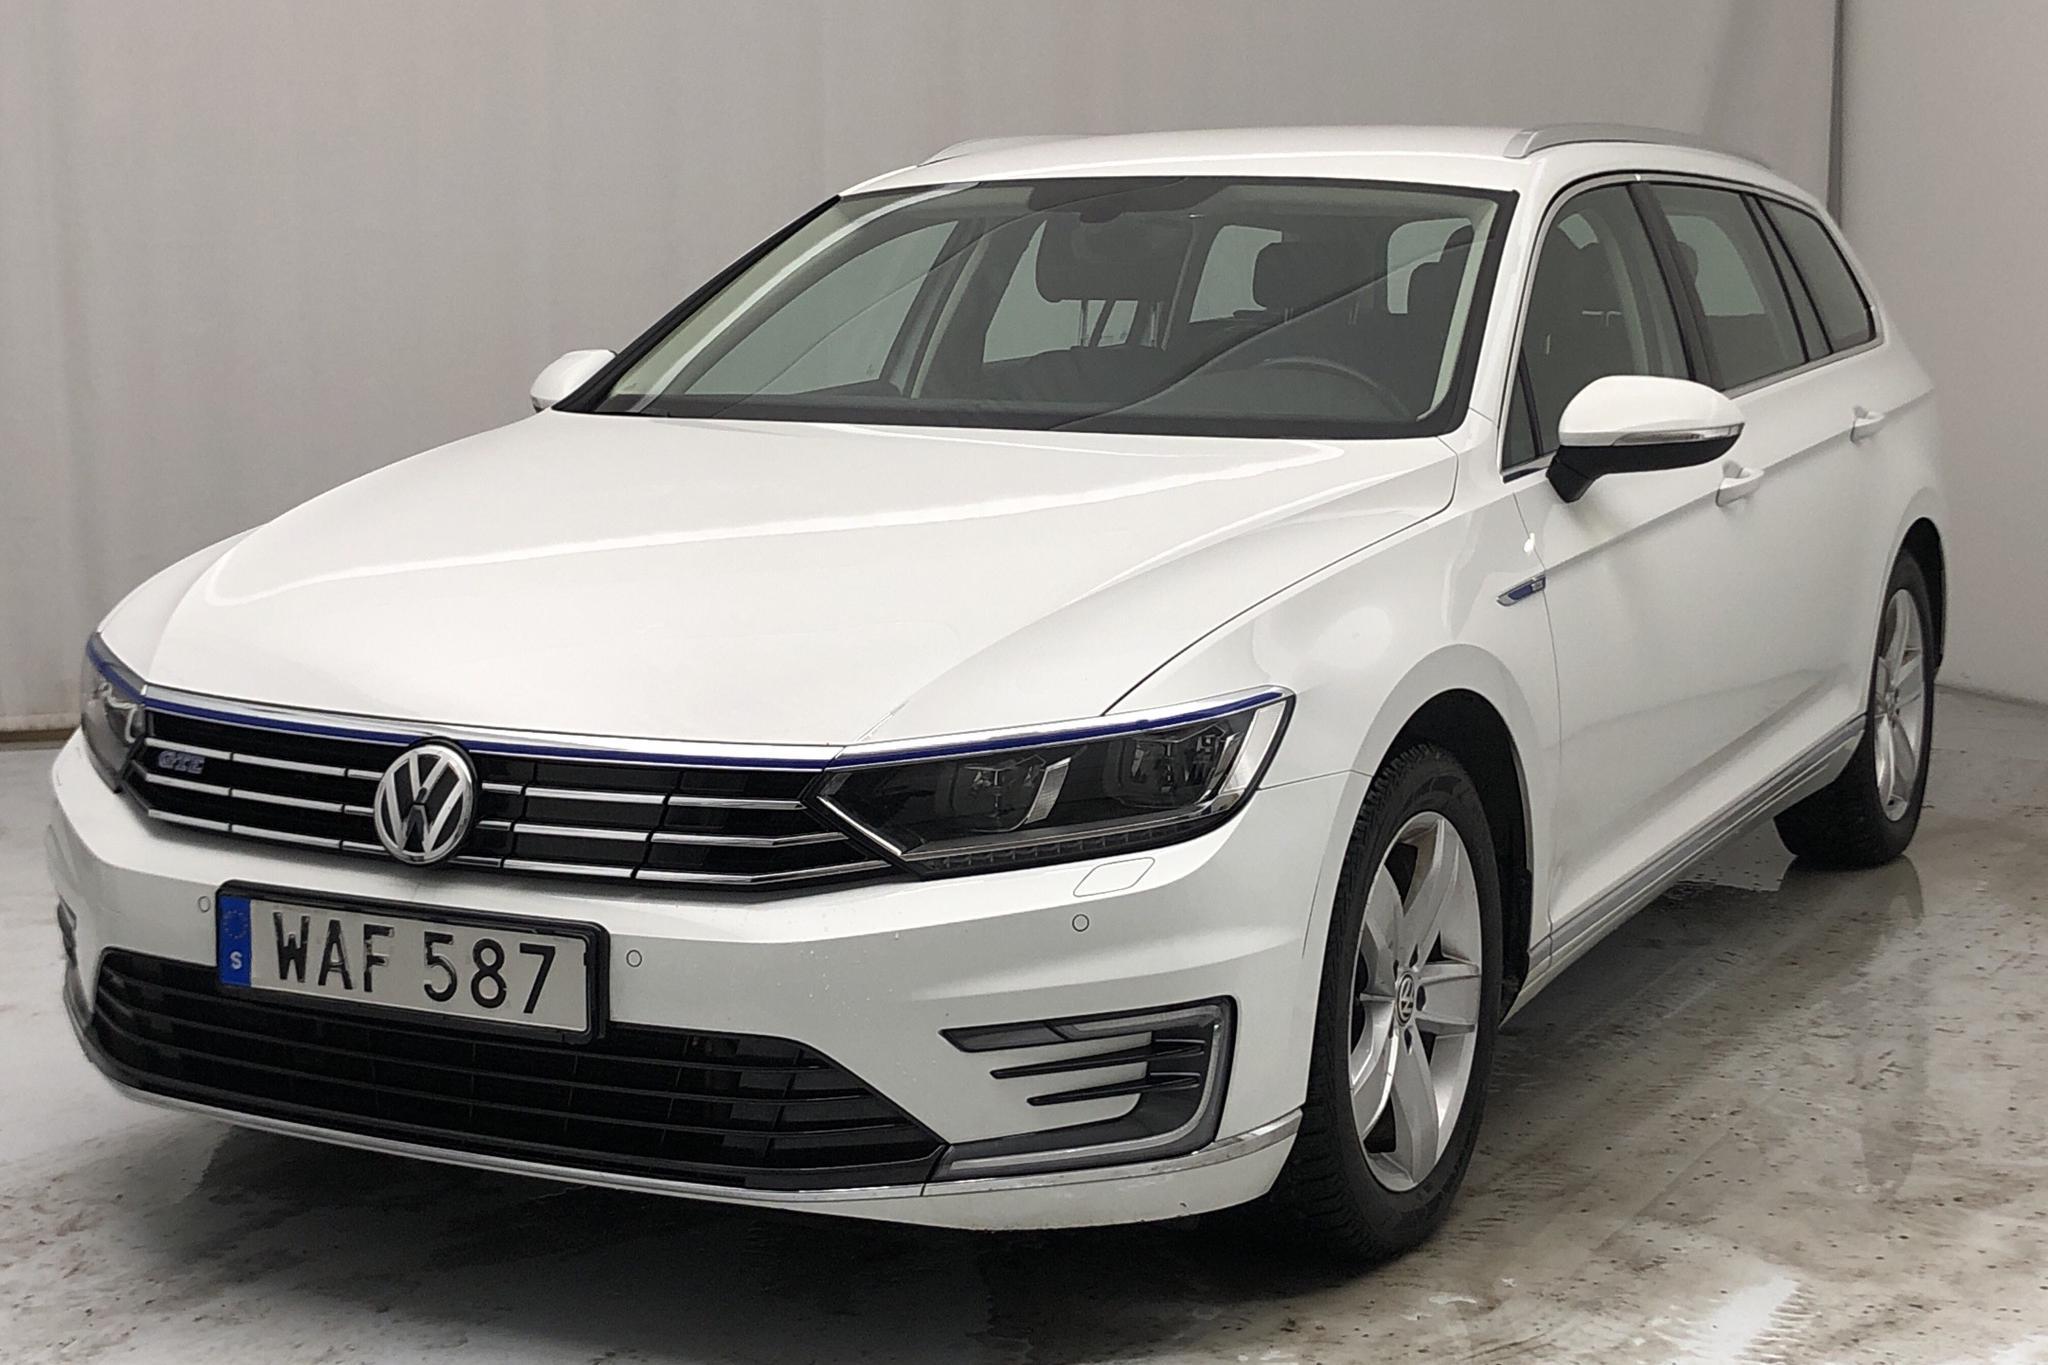 VW Passat 1.4 Plug-in-Hybrid Sportscombi (218hk) - 95 660 km - Automatic - white - 2016